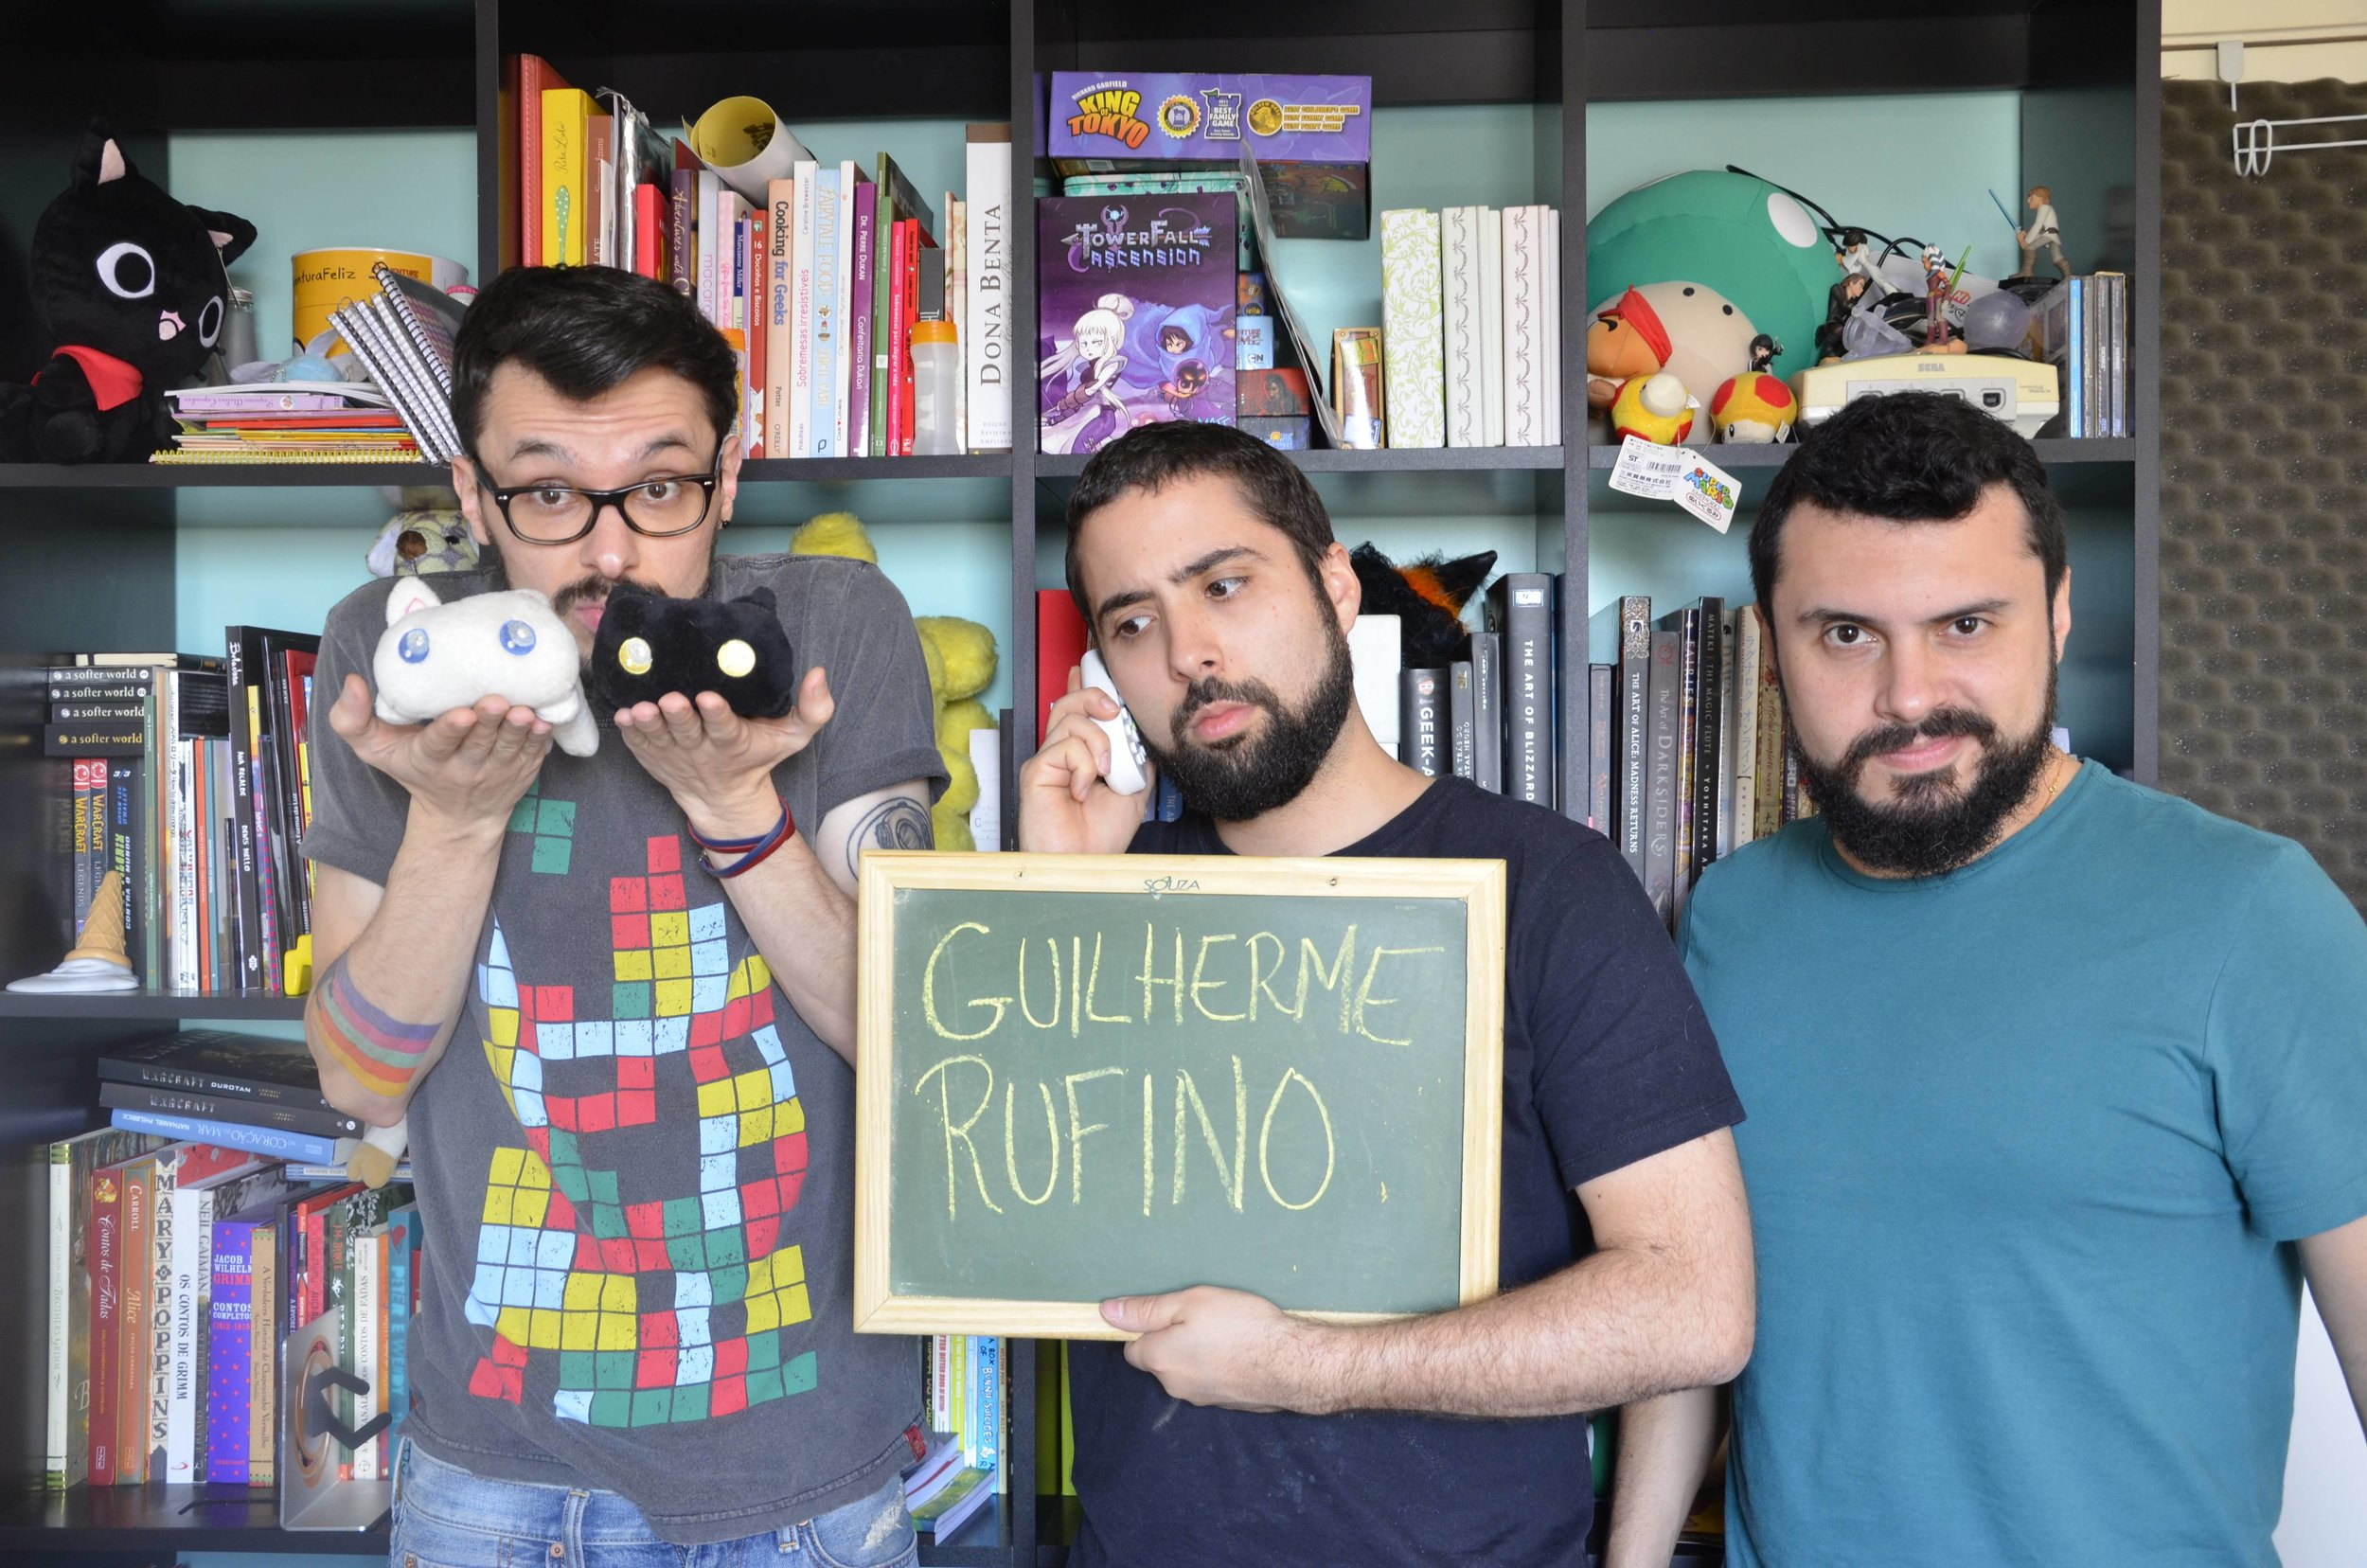 Guilherme-Rufino.jpg